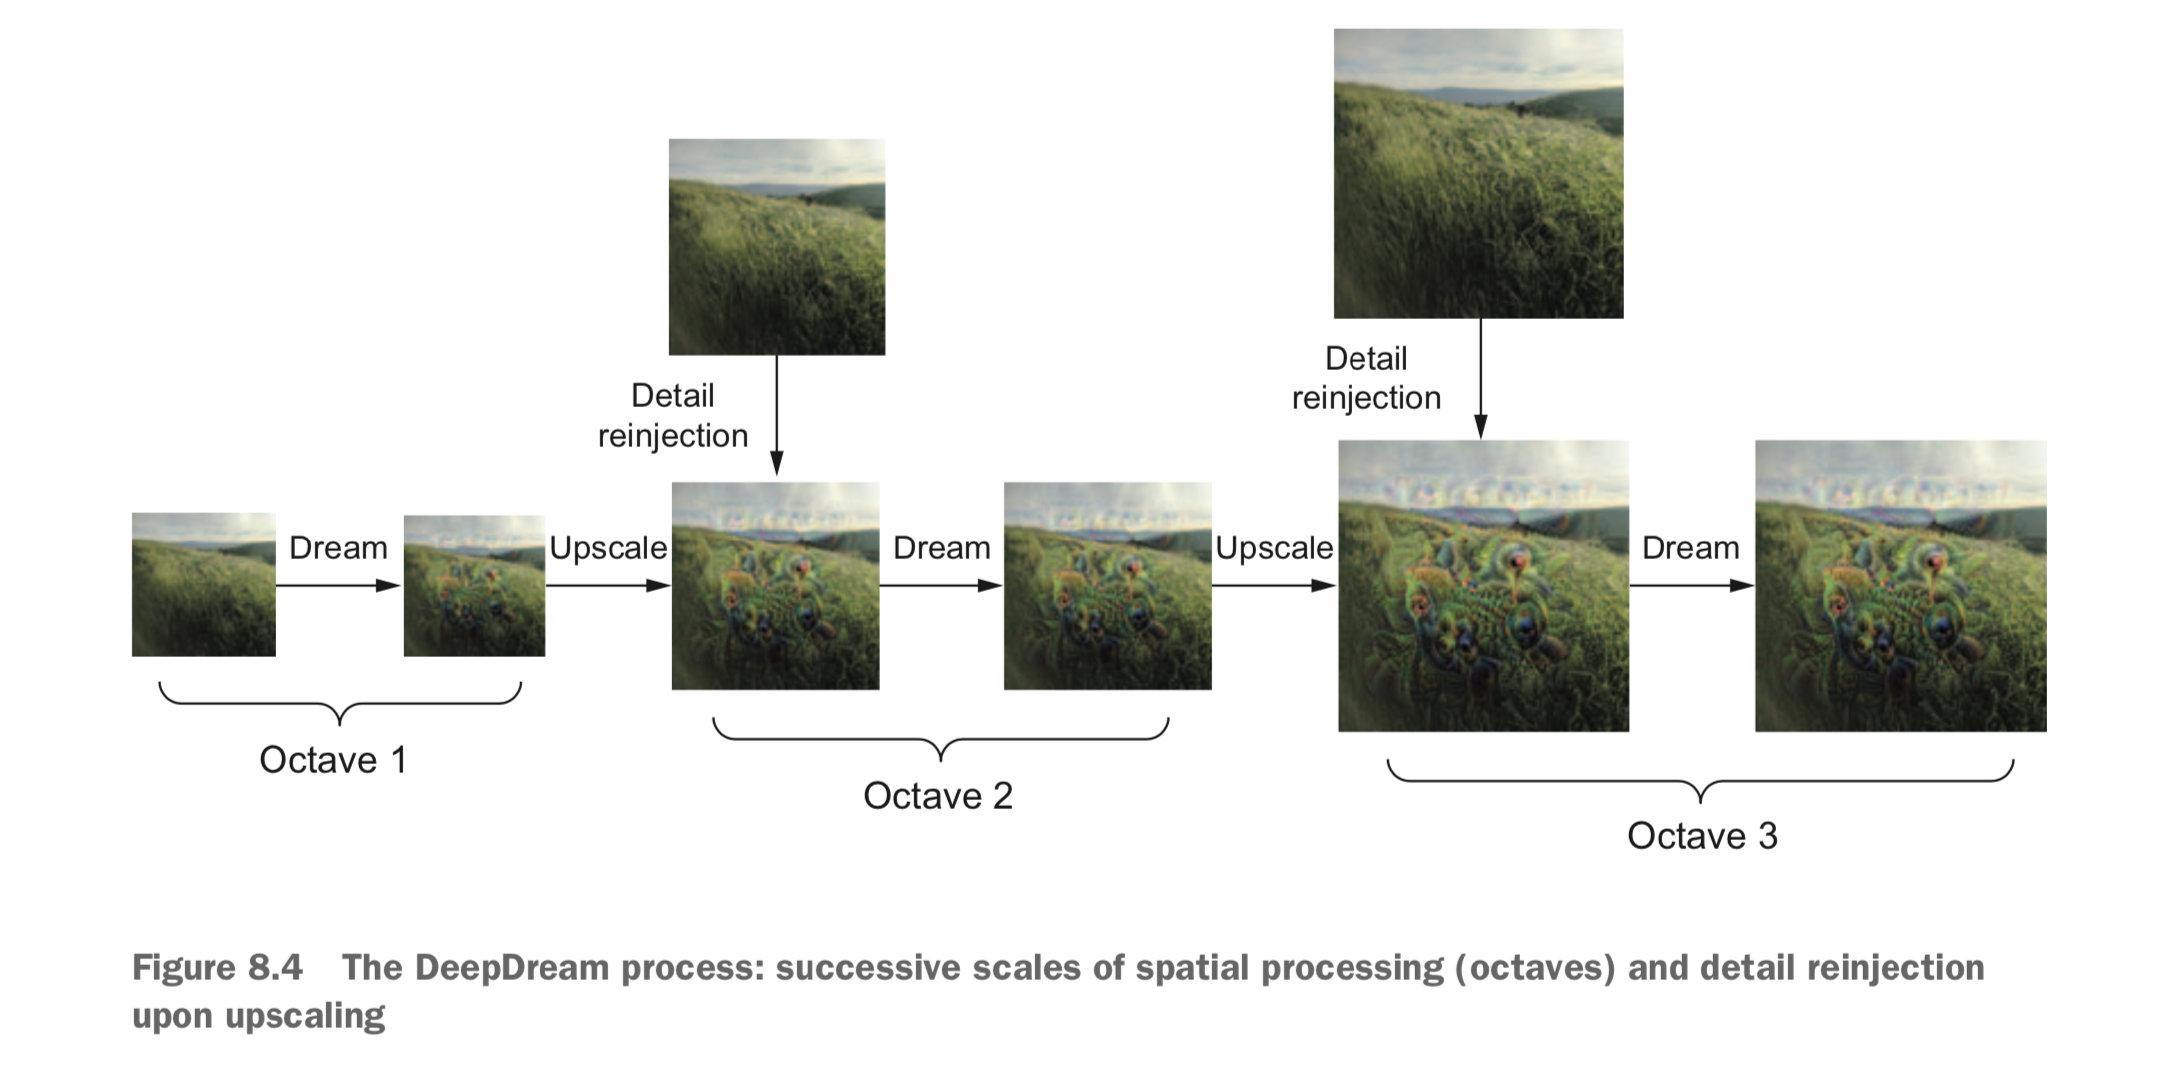 DeepDream 过程:空间处理尺度的连续放大(八度)与放大时重新注入细节